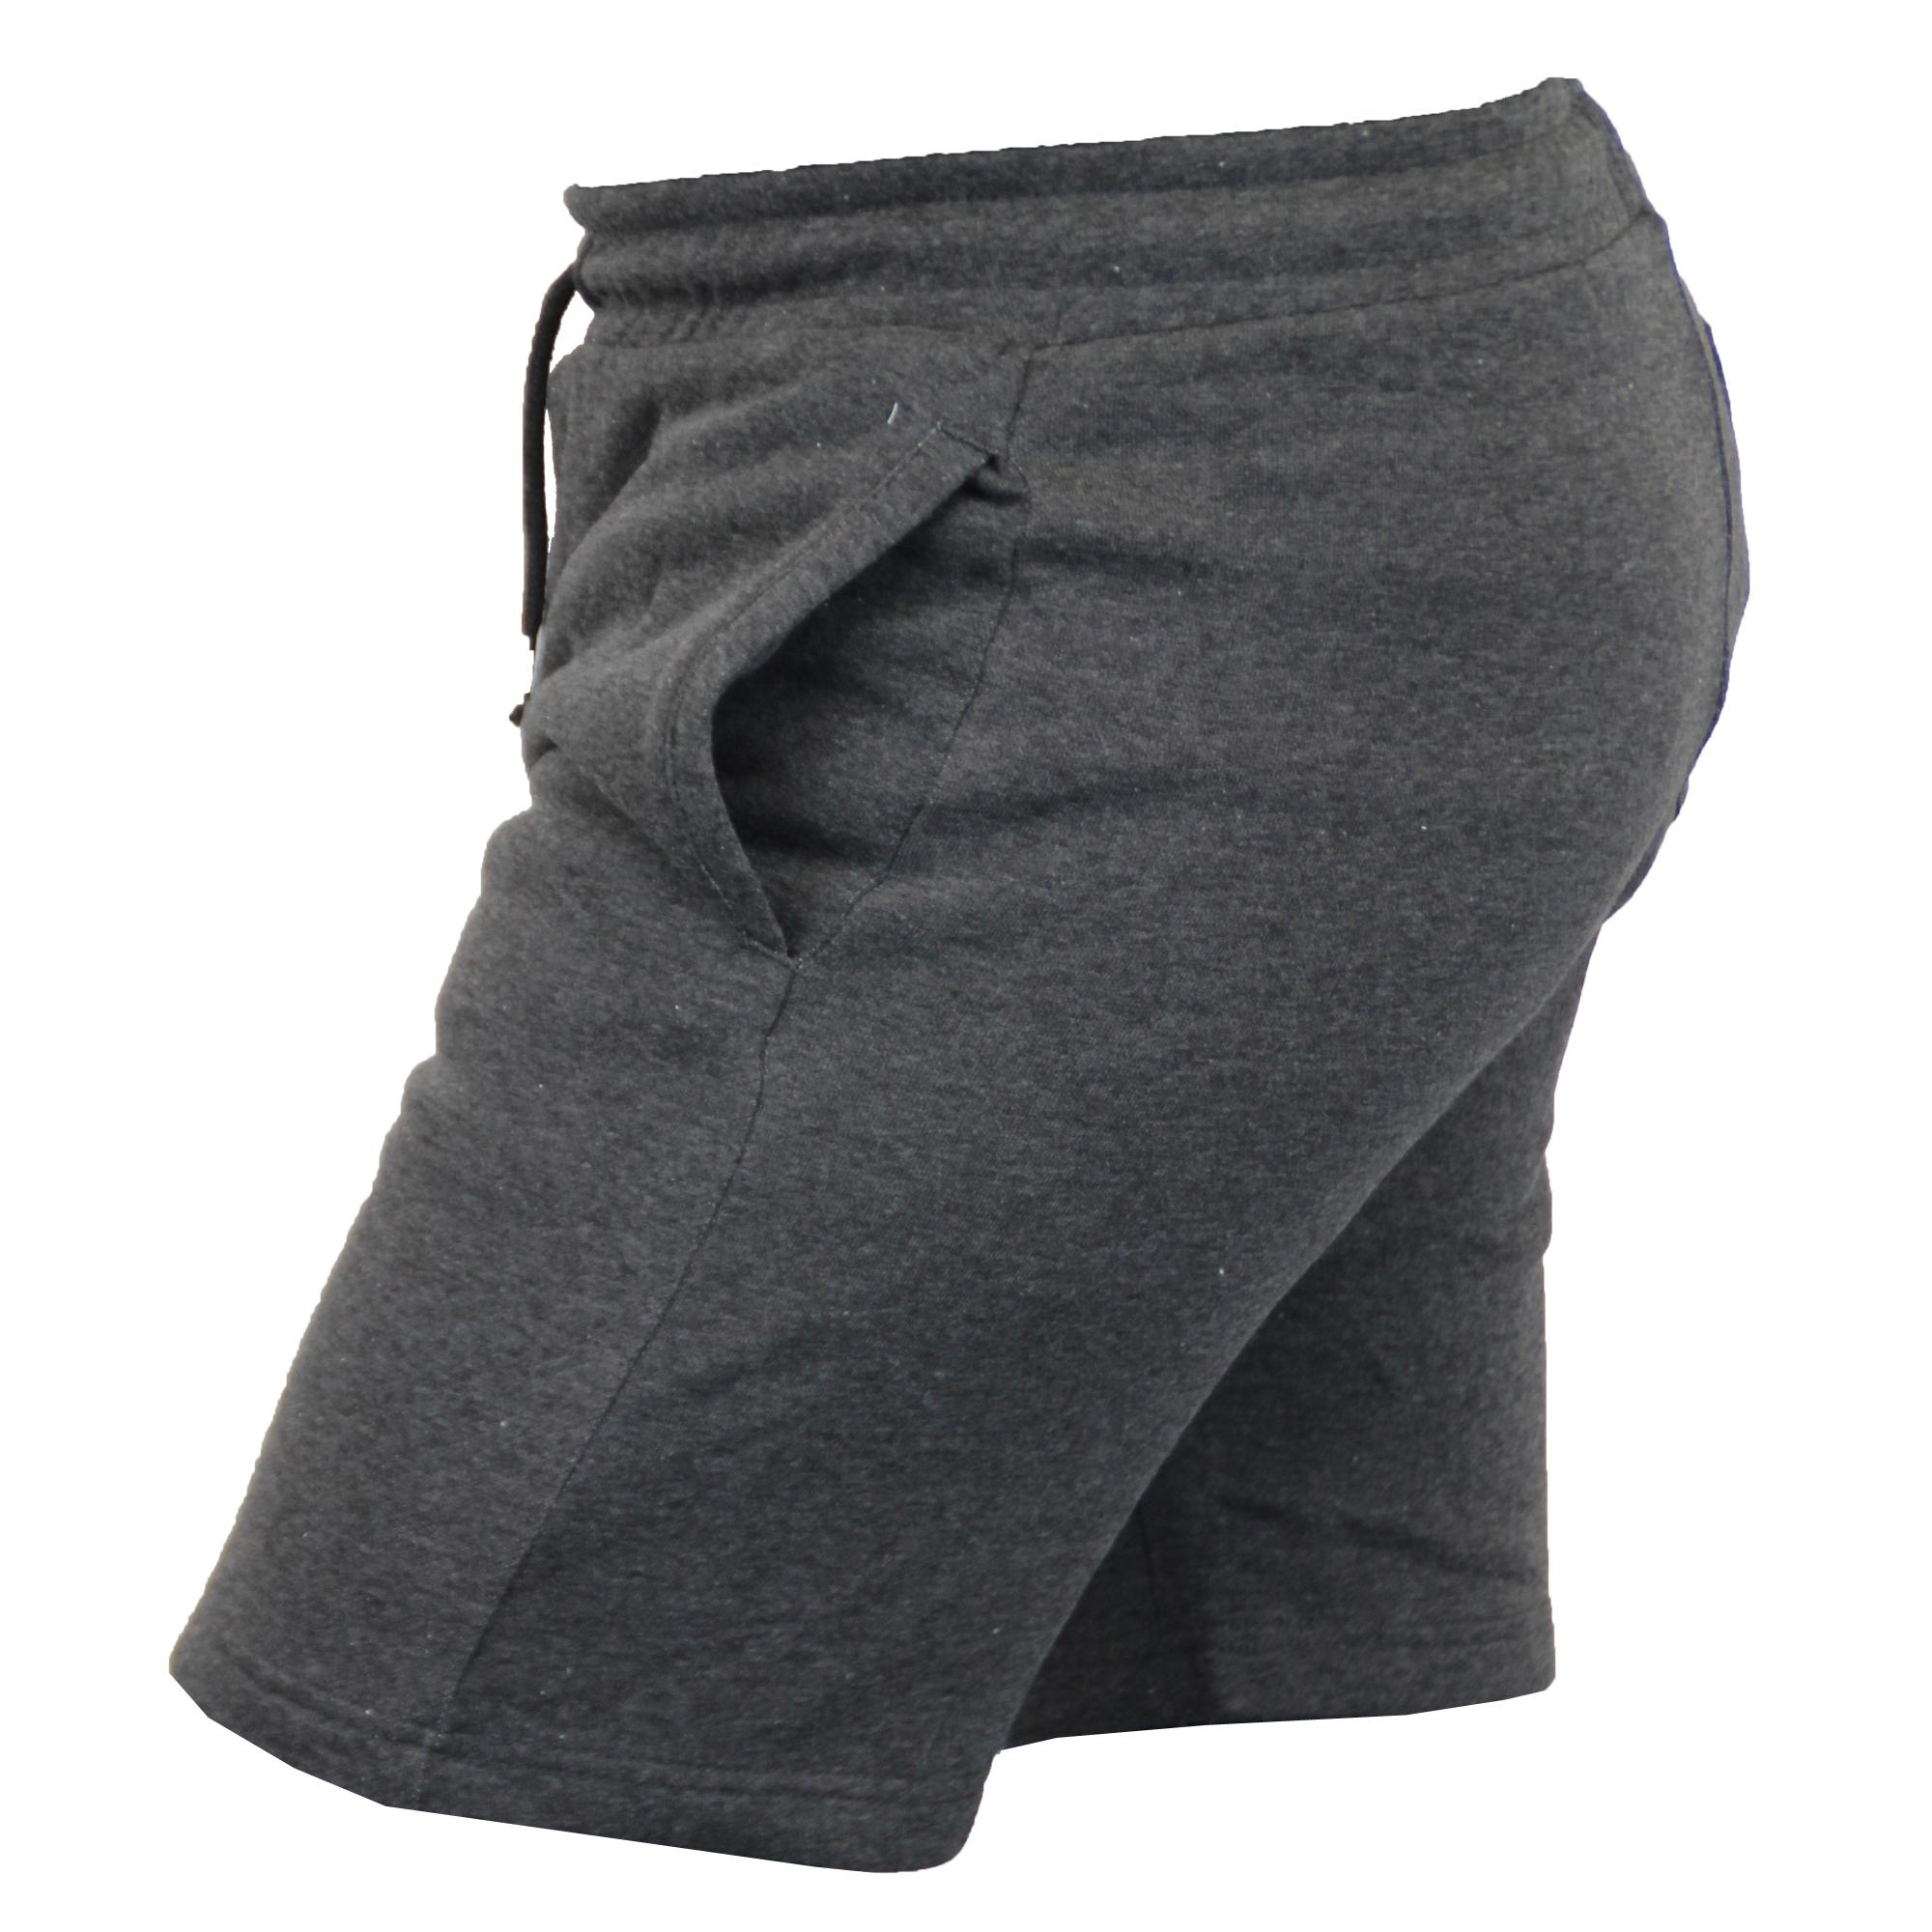 Mens-Jogger-Shorts-Tarley-by-Brave-Soul-Knee-Length-Casual-Fleece-Lined-Summer thumbnail 6